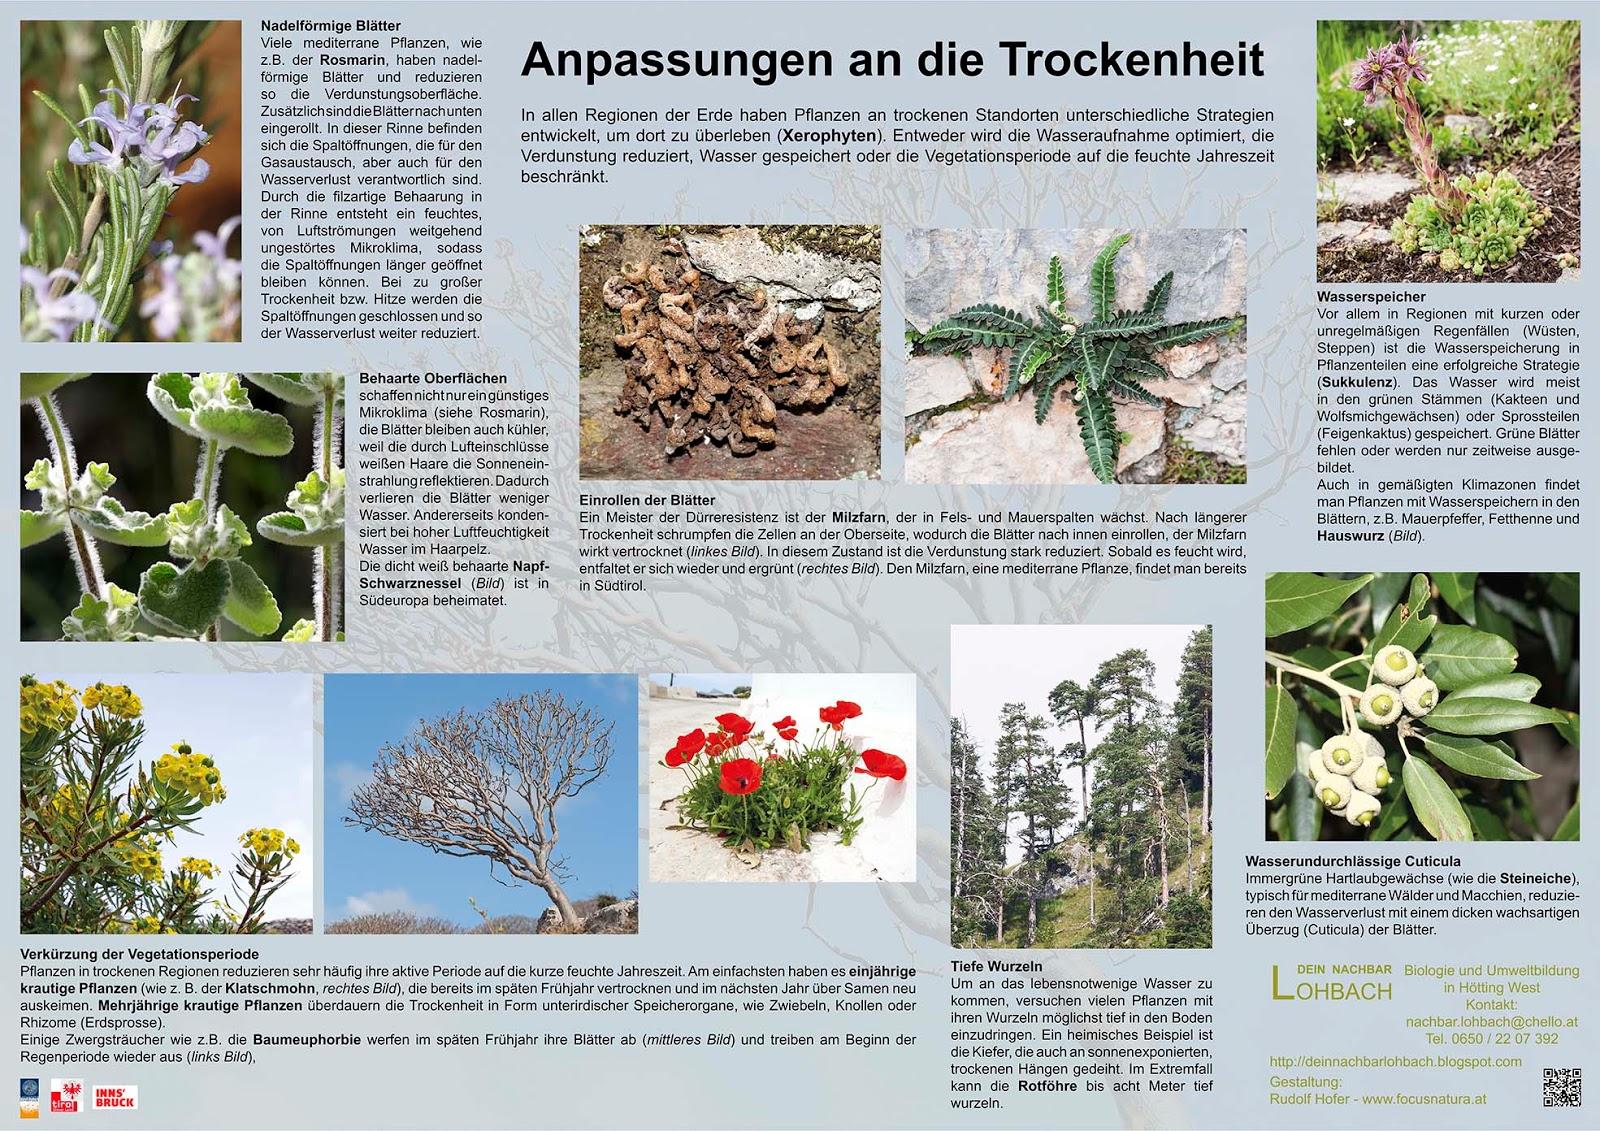 Nett Kiefer Geschlossen Haben Fotos - Der Schaltplan - triangre.info